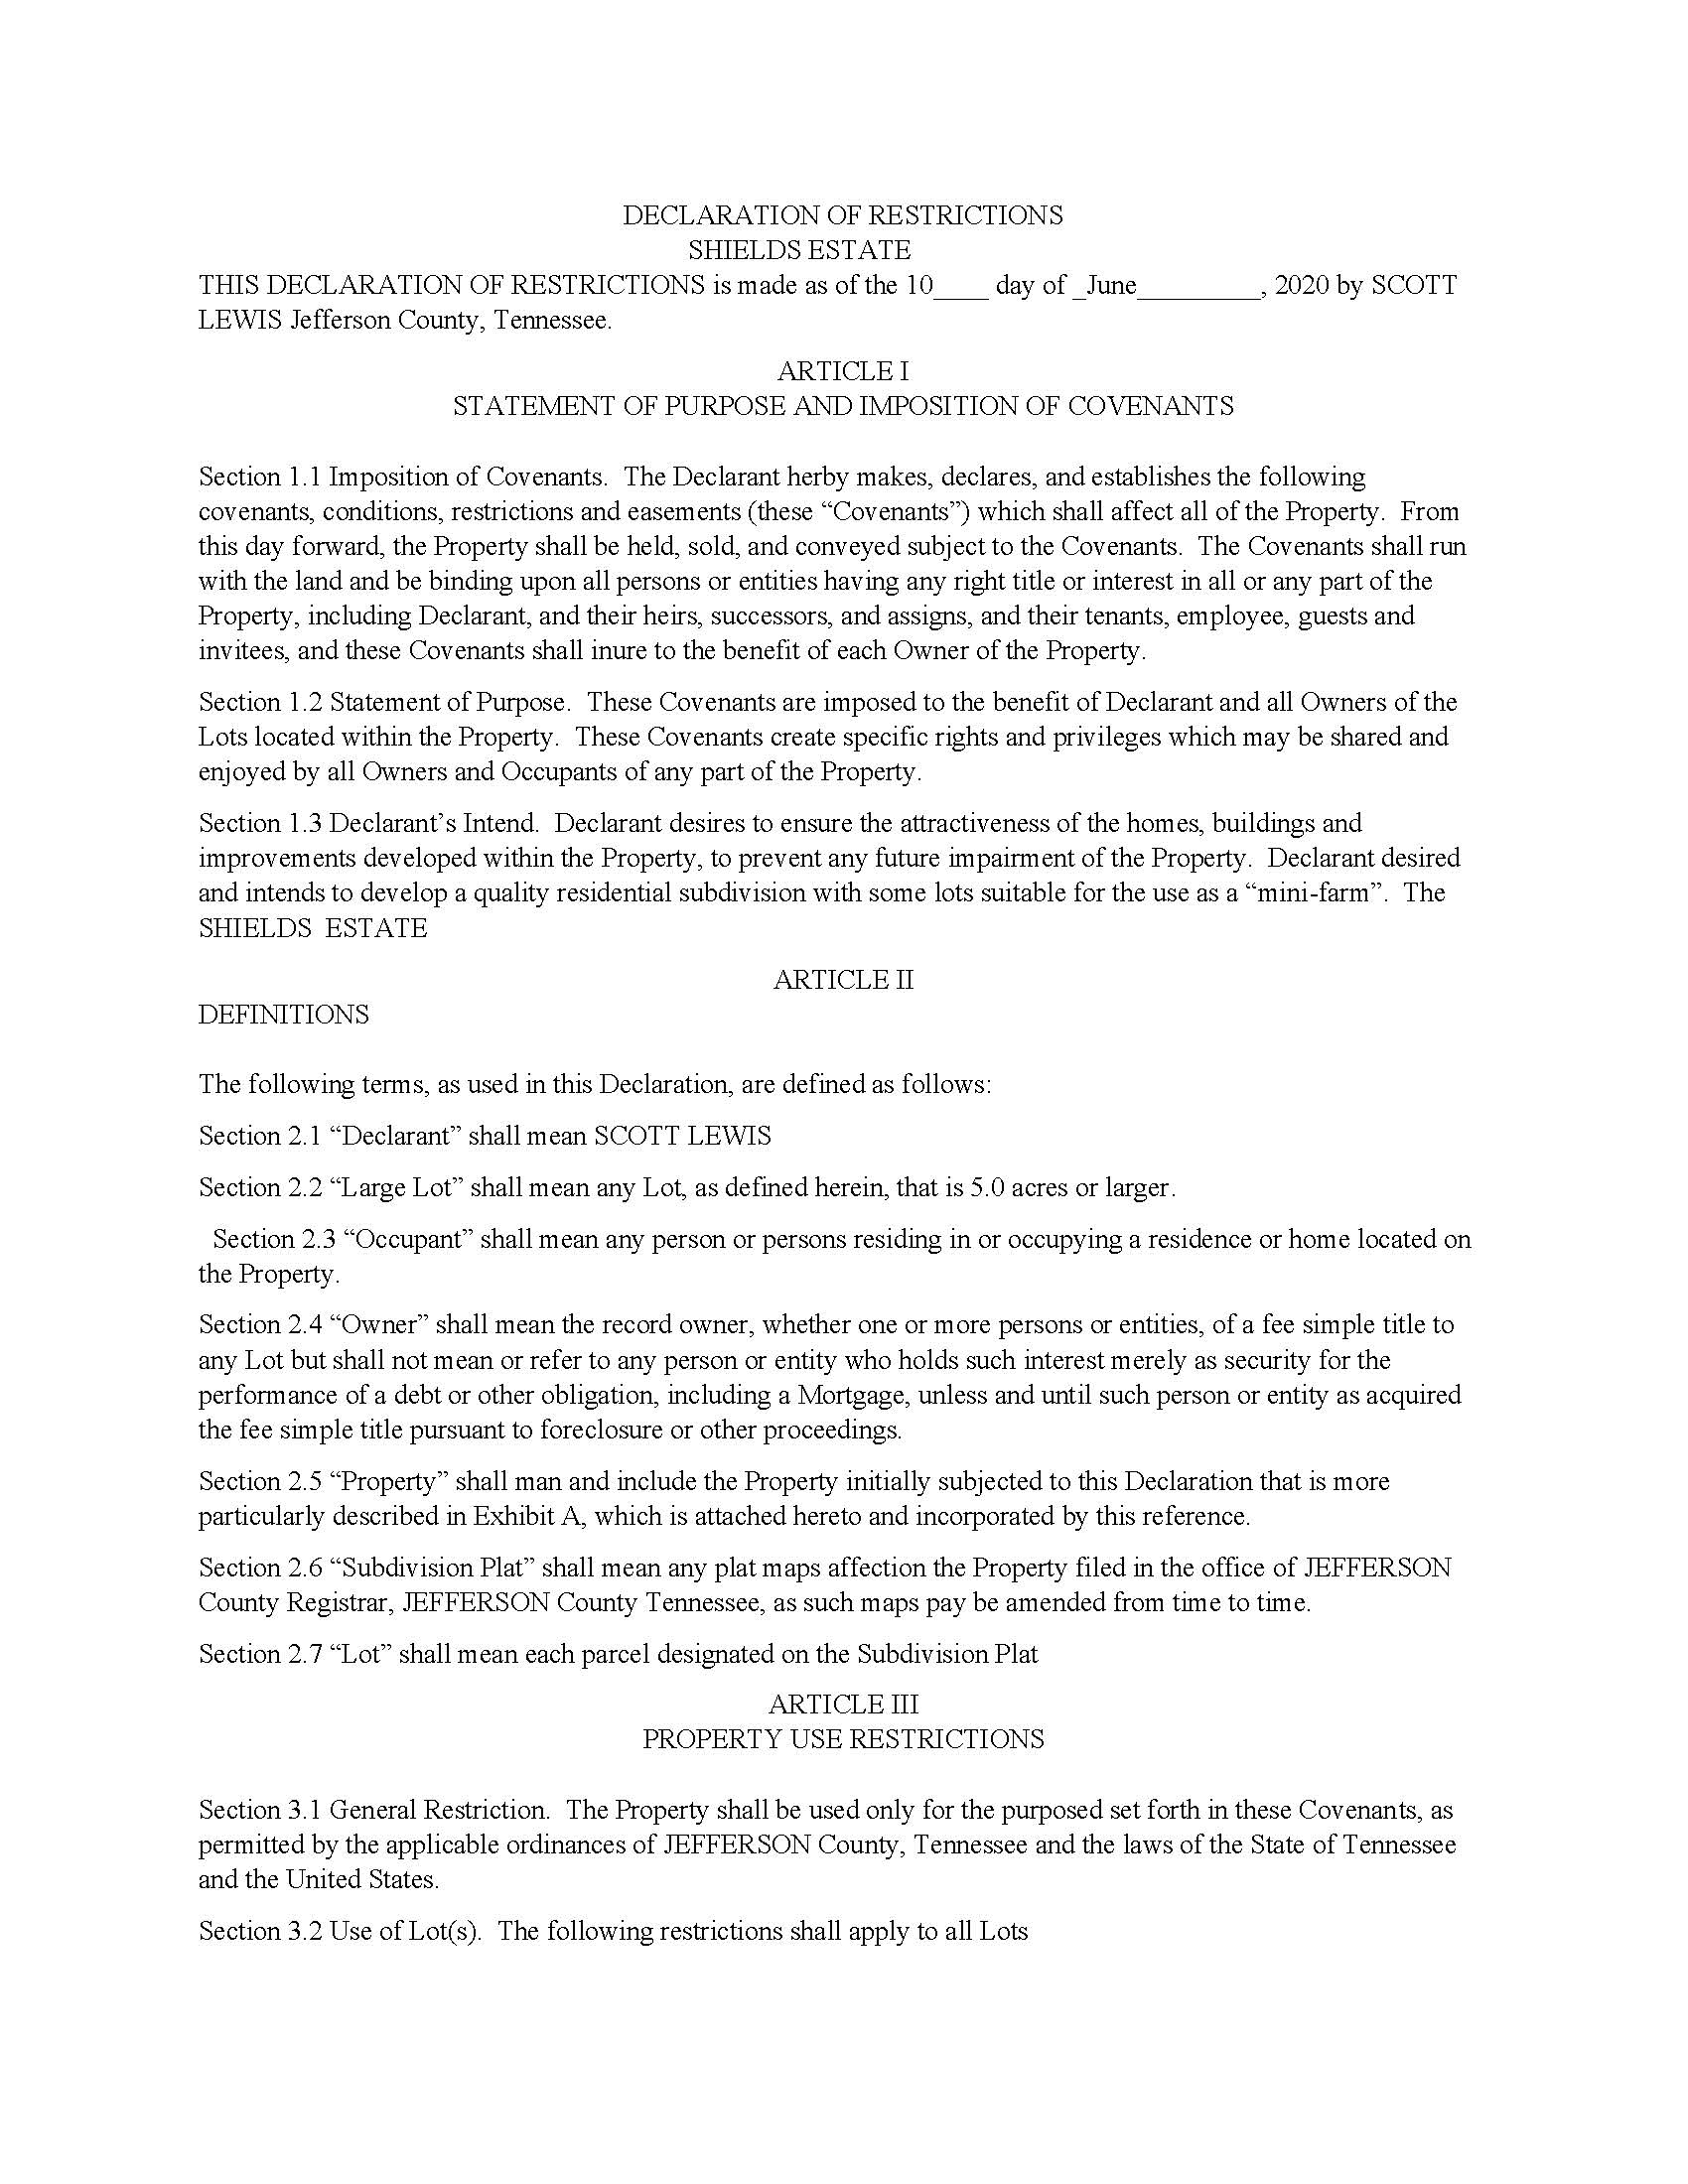 SCOTT LEWIS Restrictions_Page_1